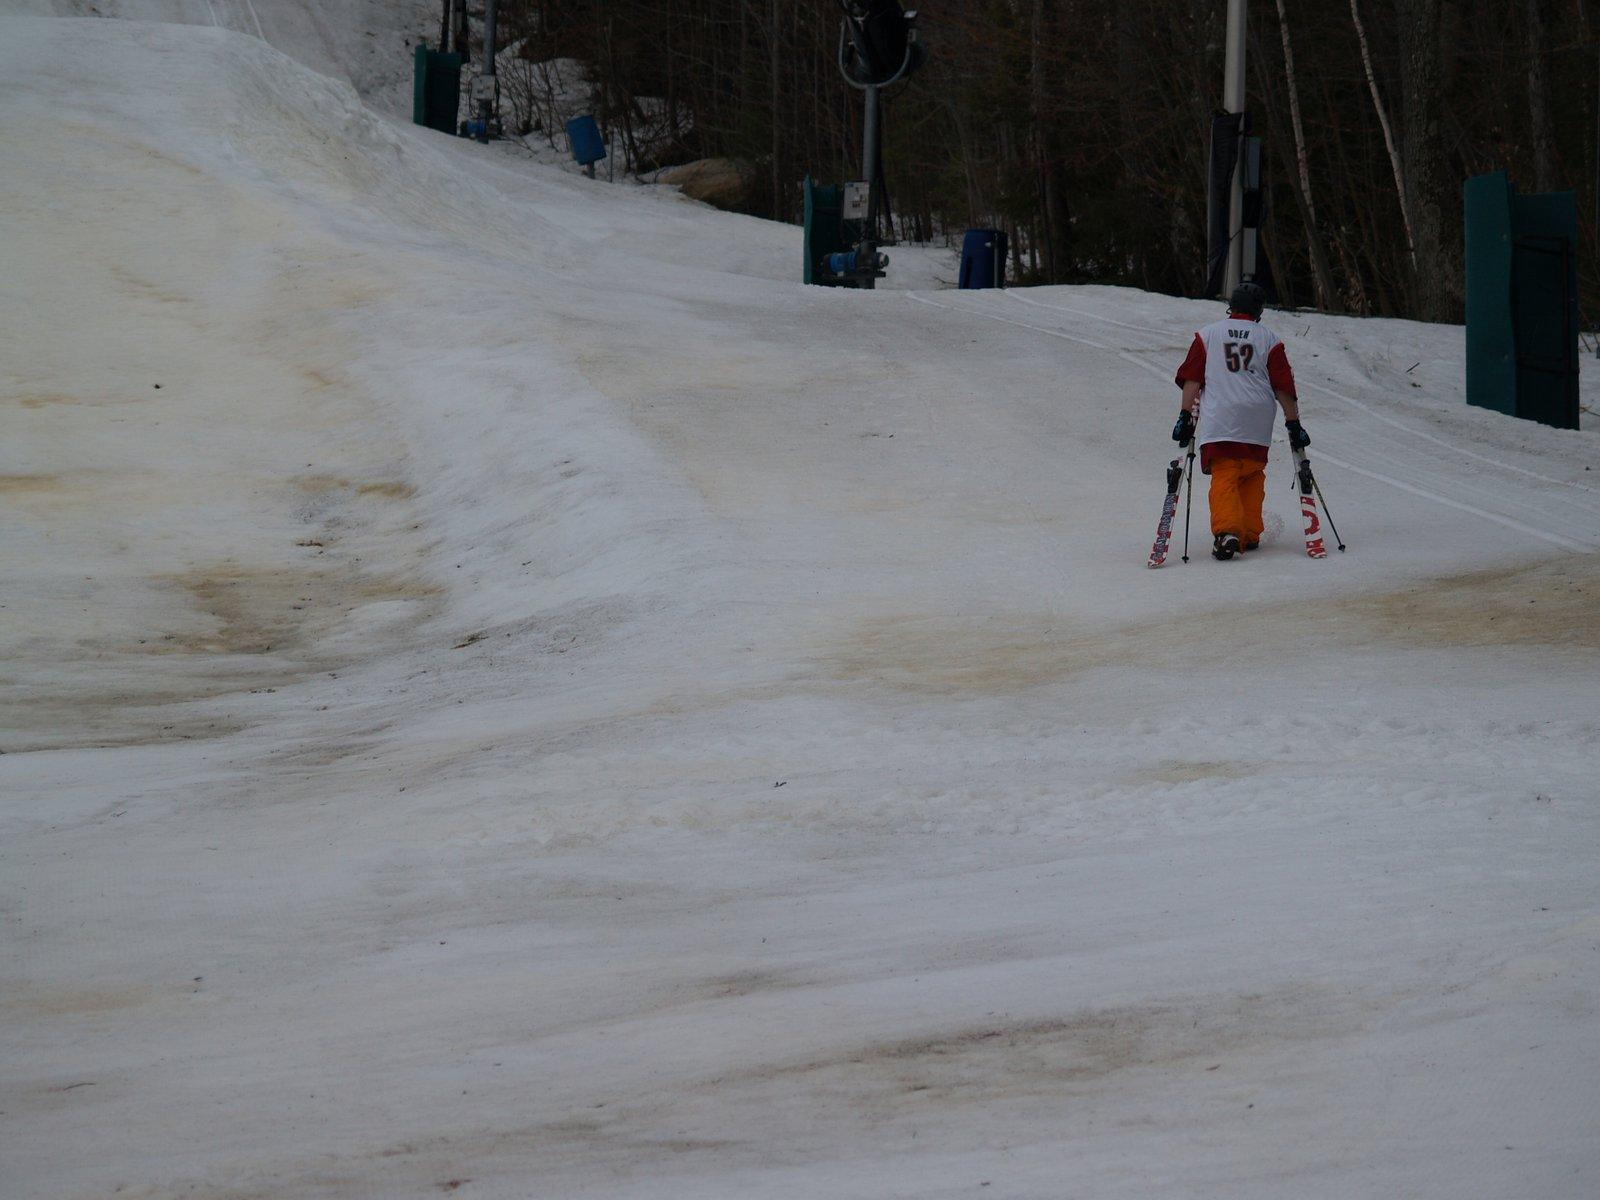 Melting snow = i hate cm